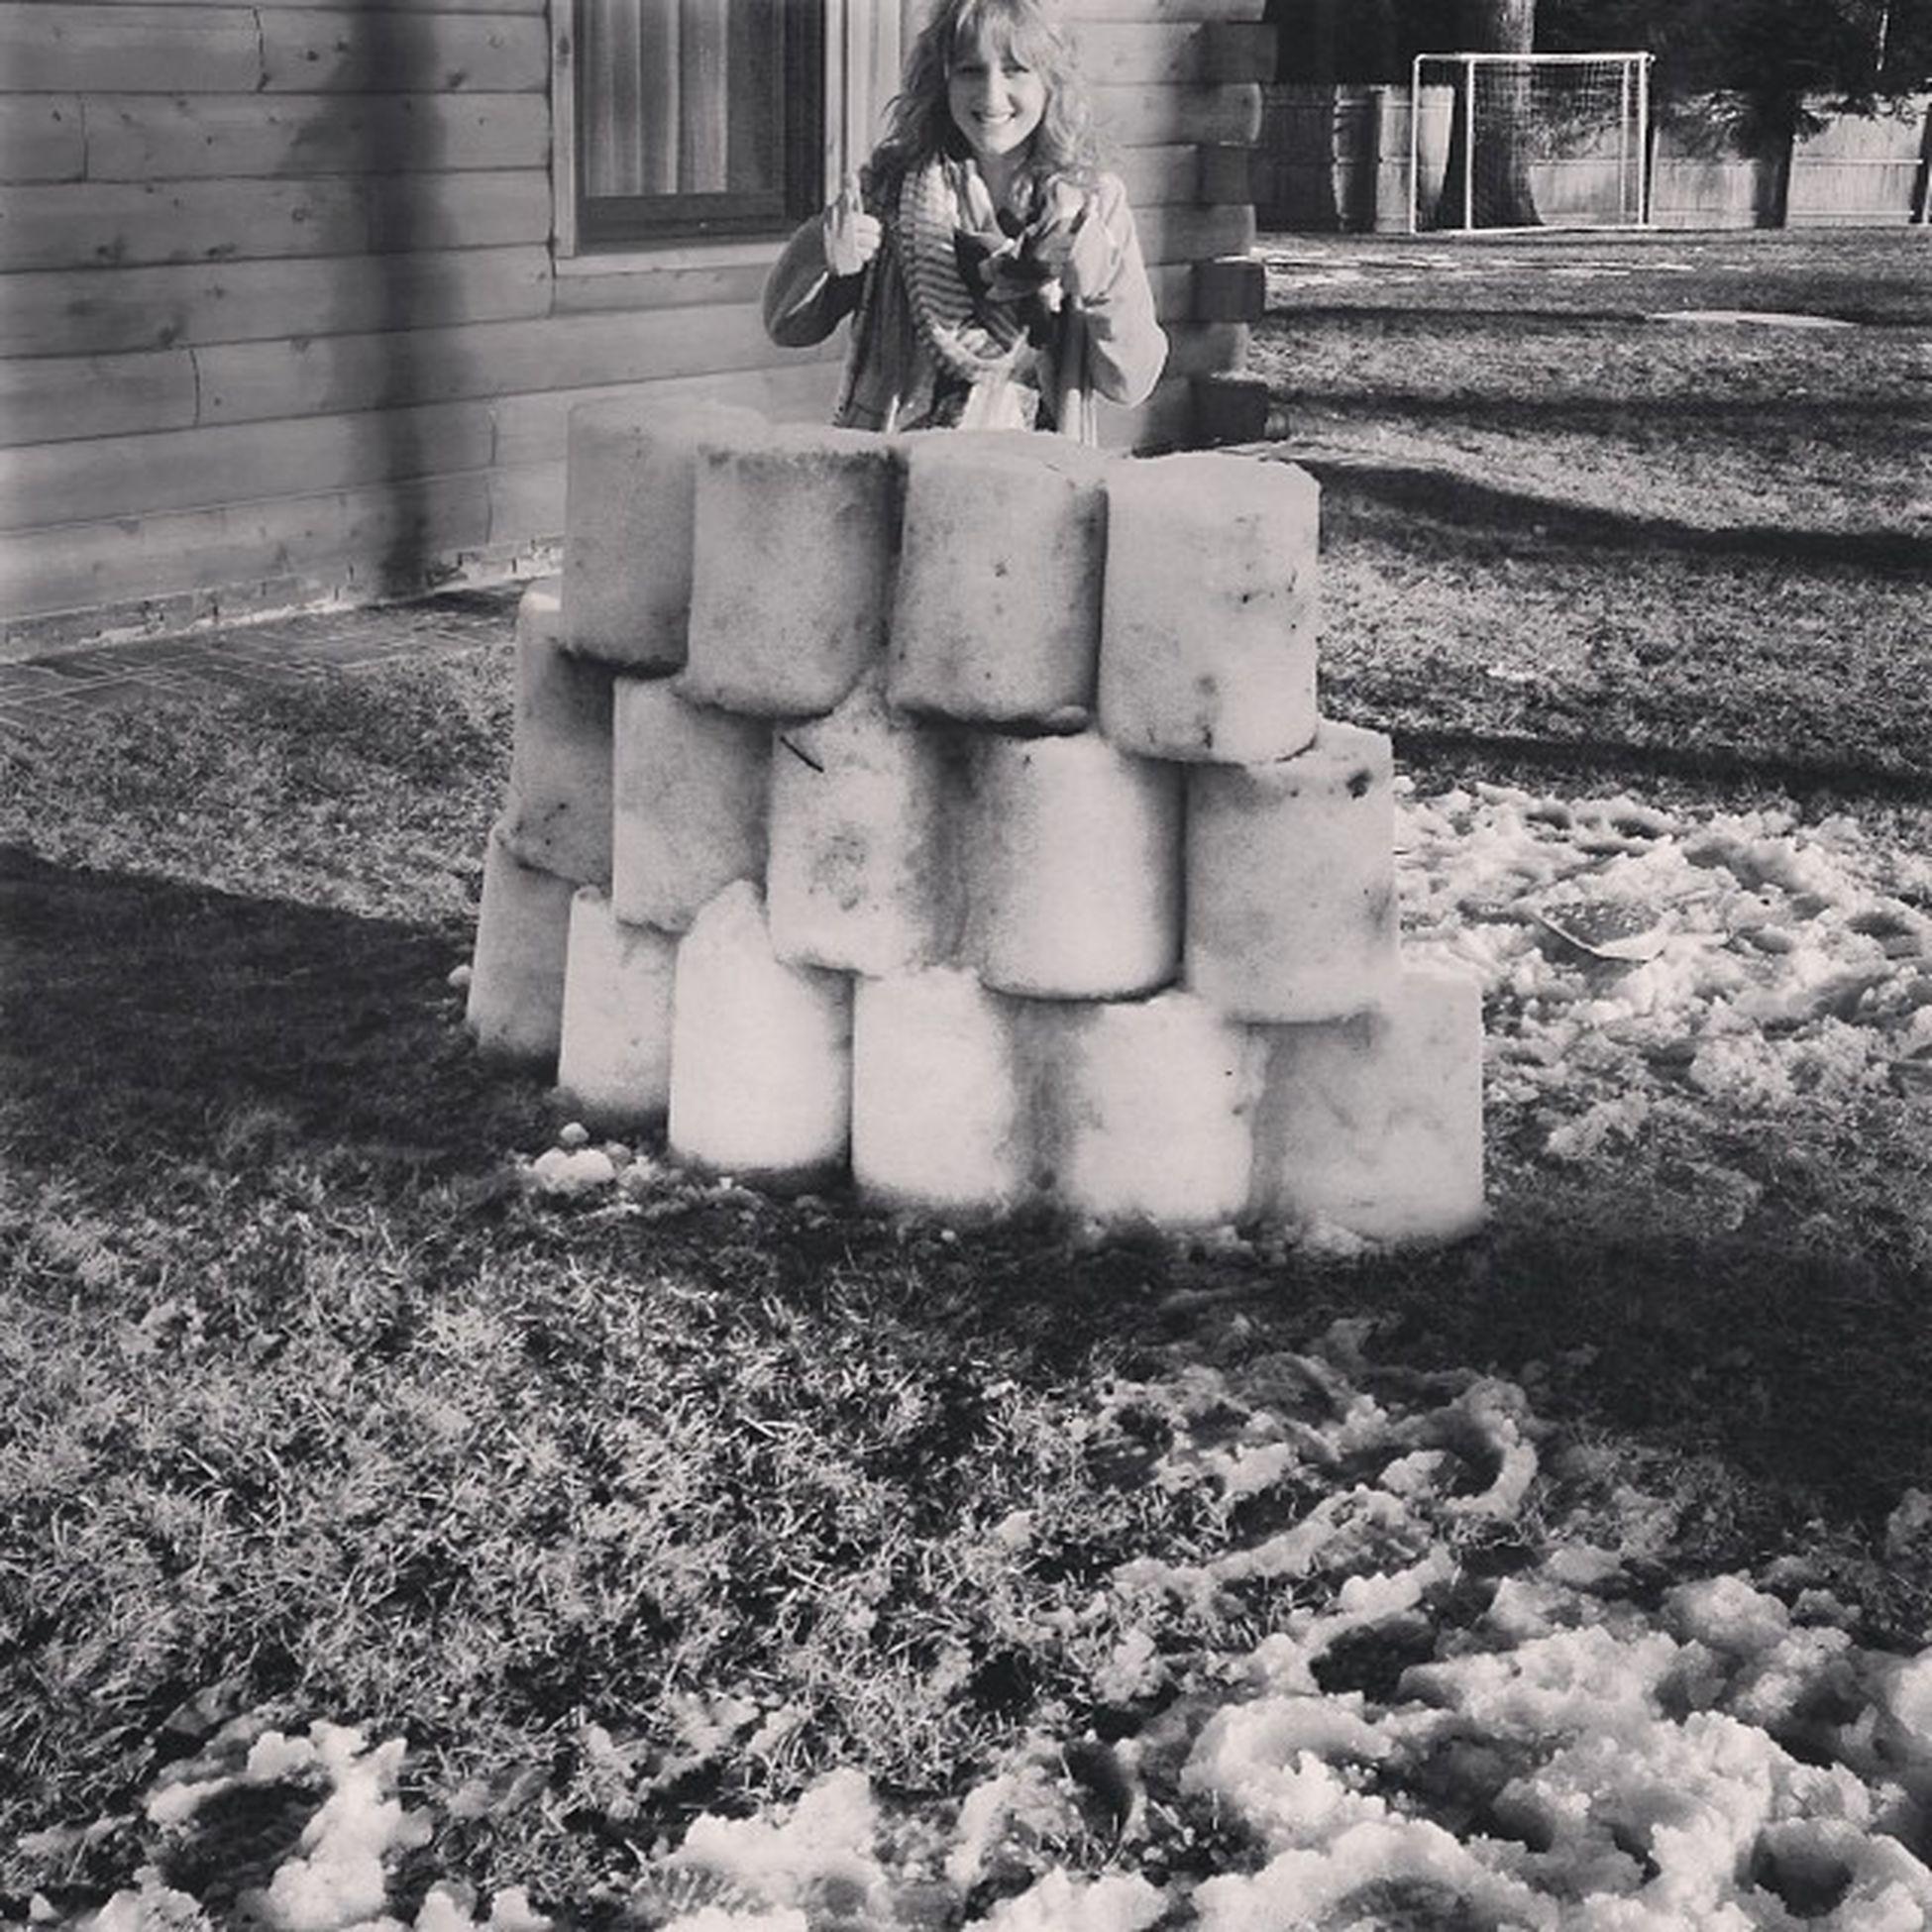 snowball war ❄️⛄️❄️ Hidingout